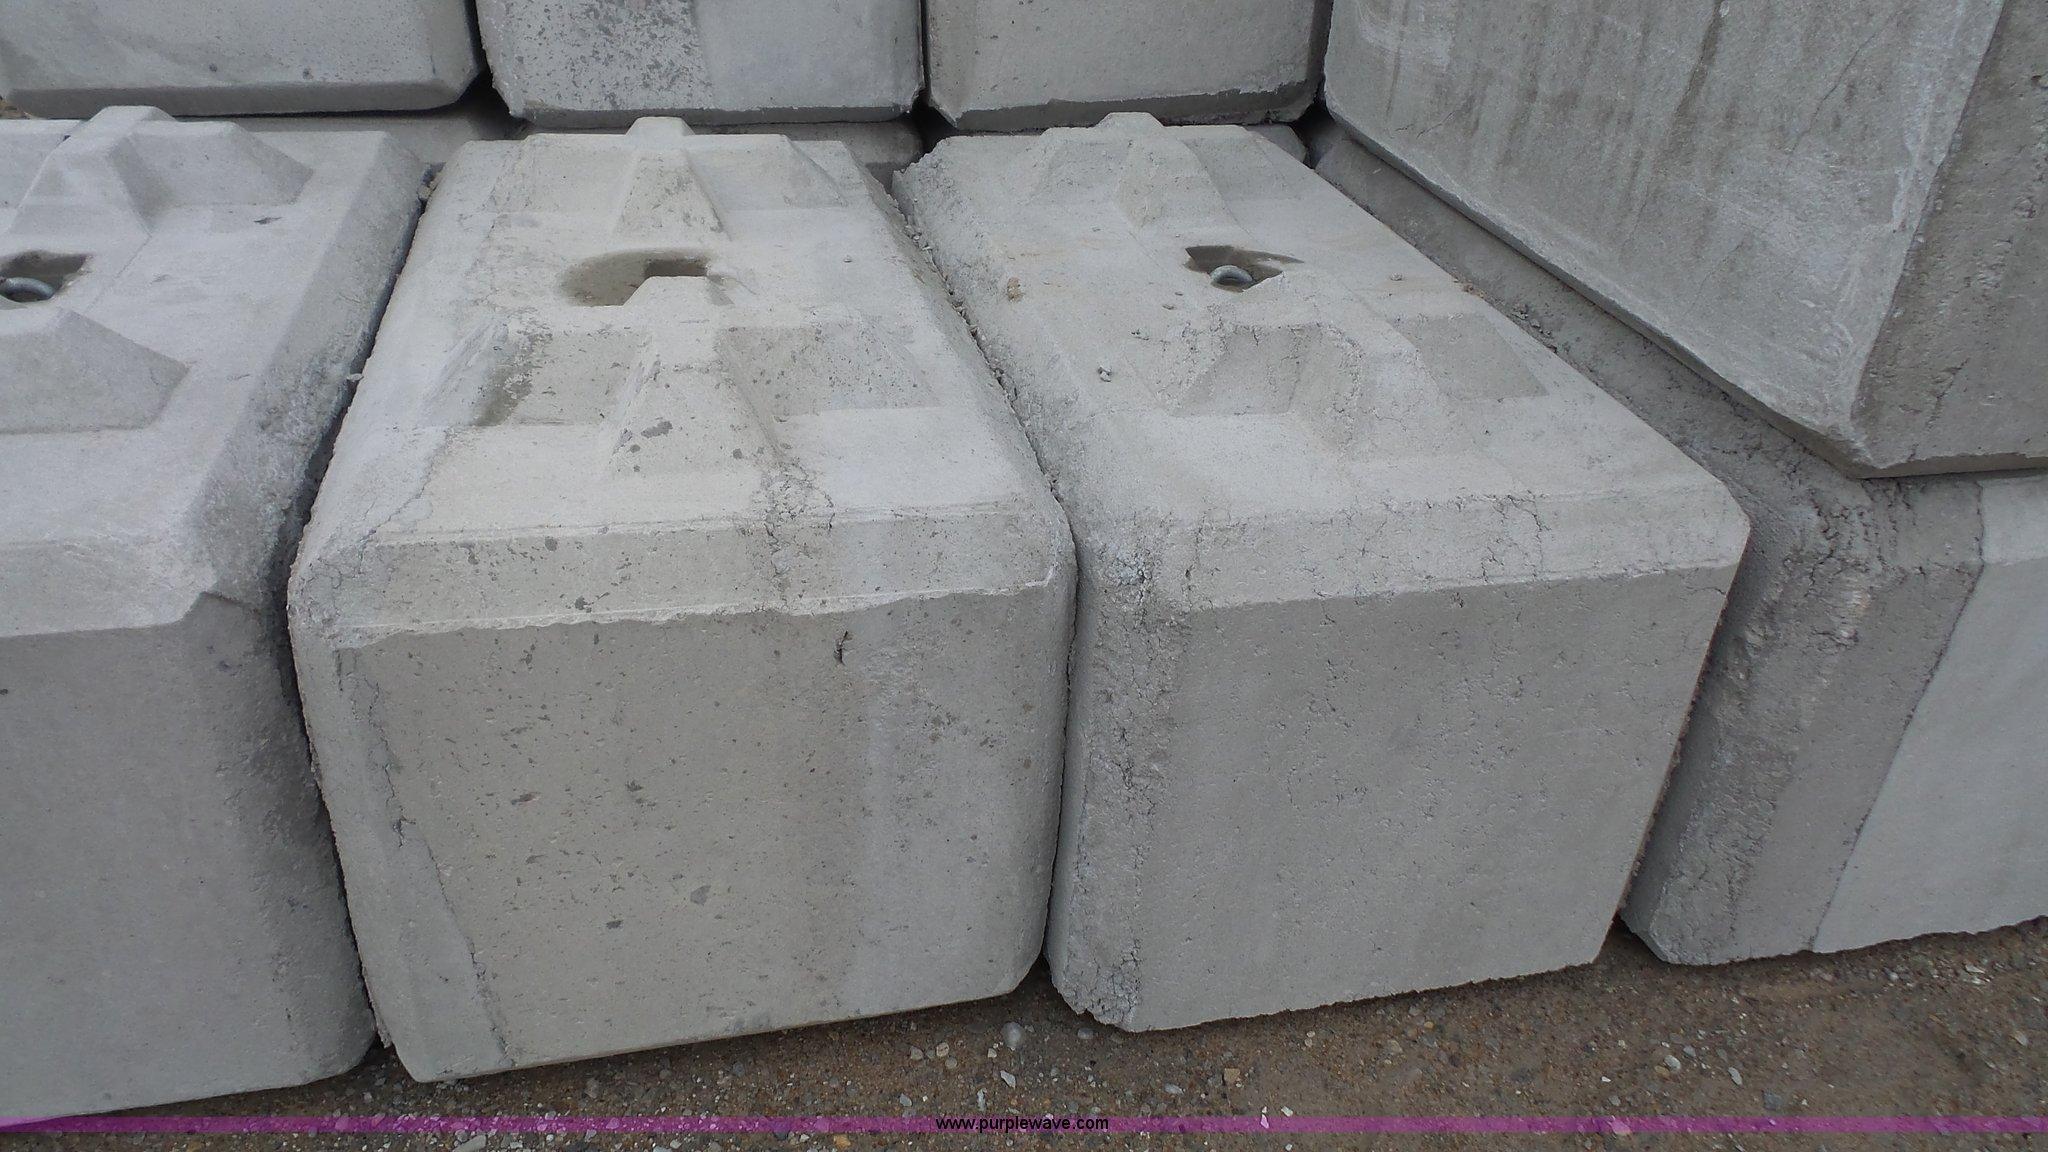 50 Regular Concrete Construction Blocks Item F1137 3